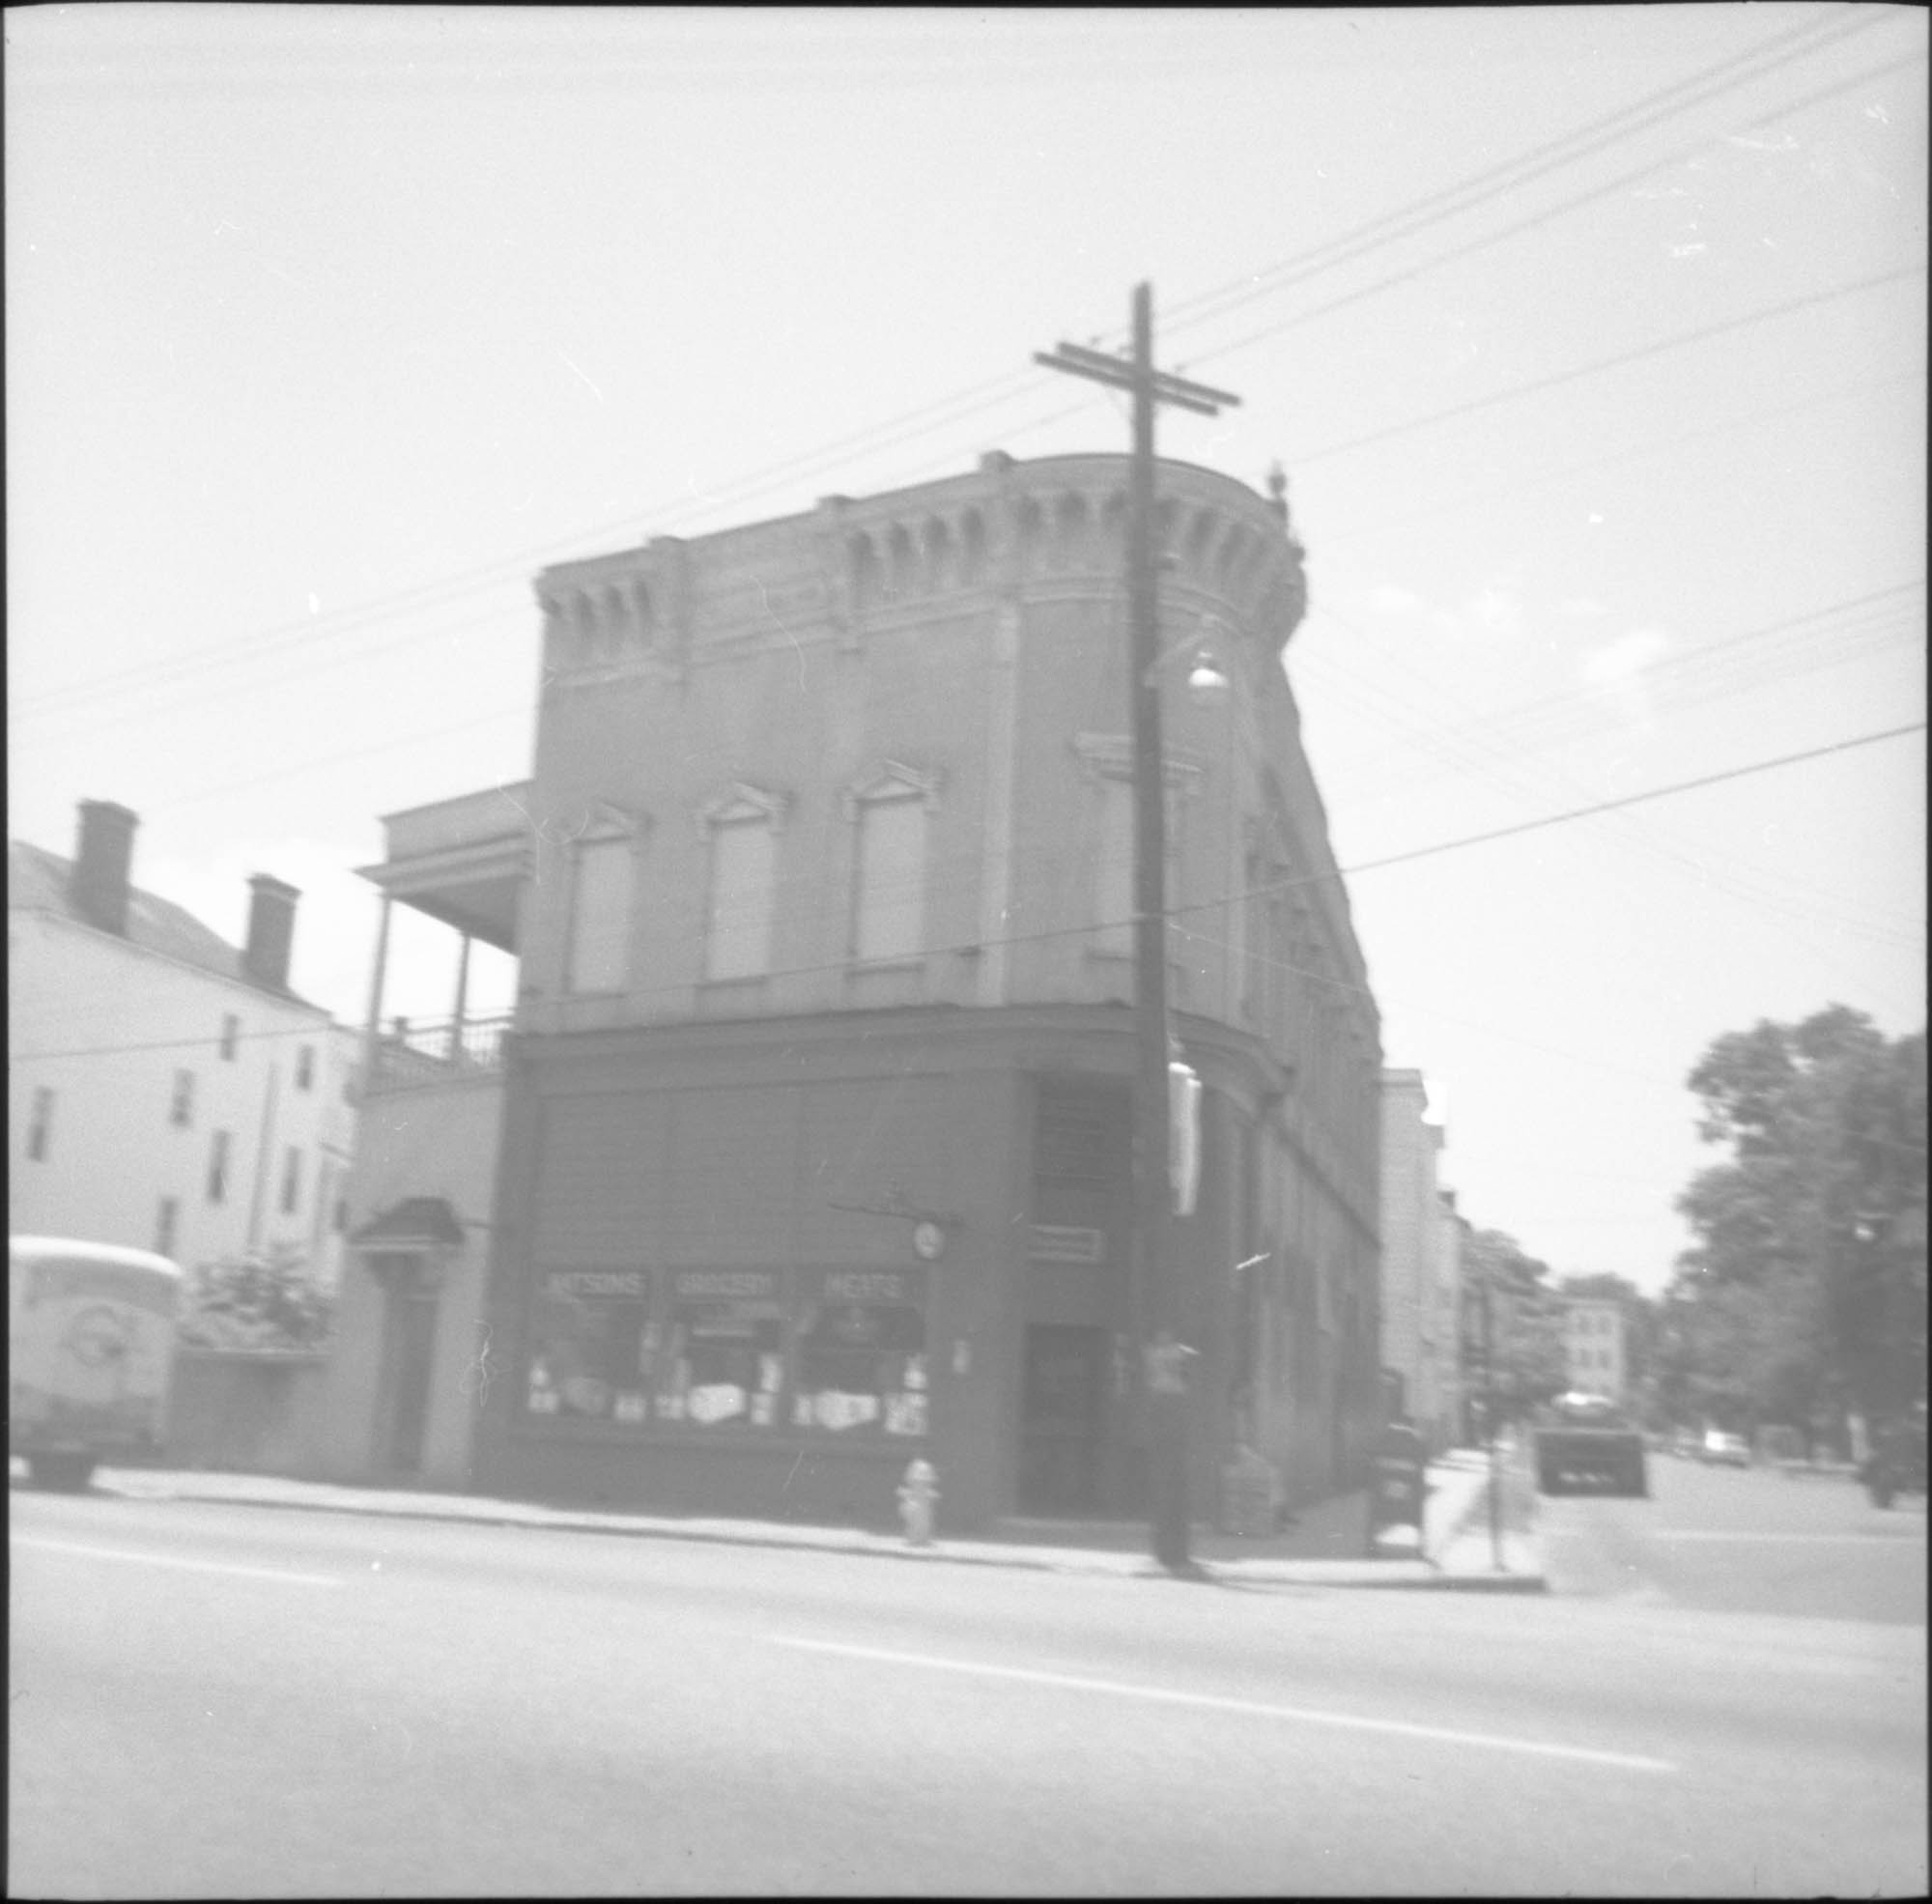 309 East Bay Street